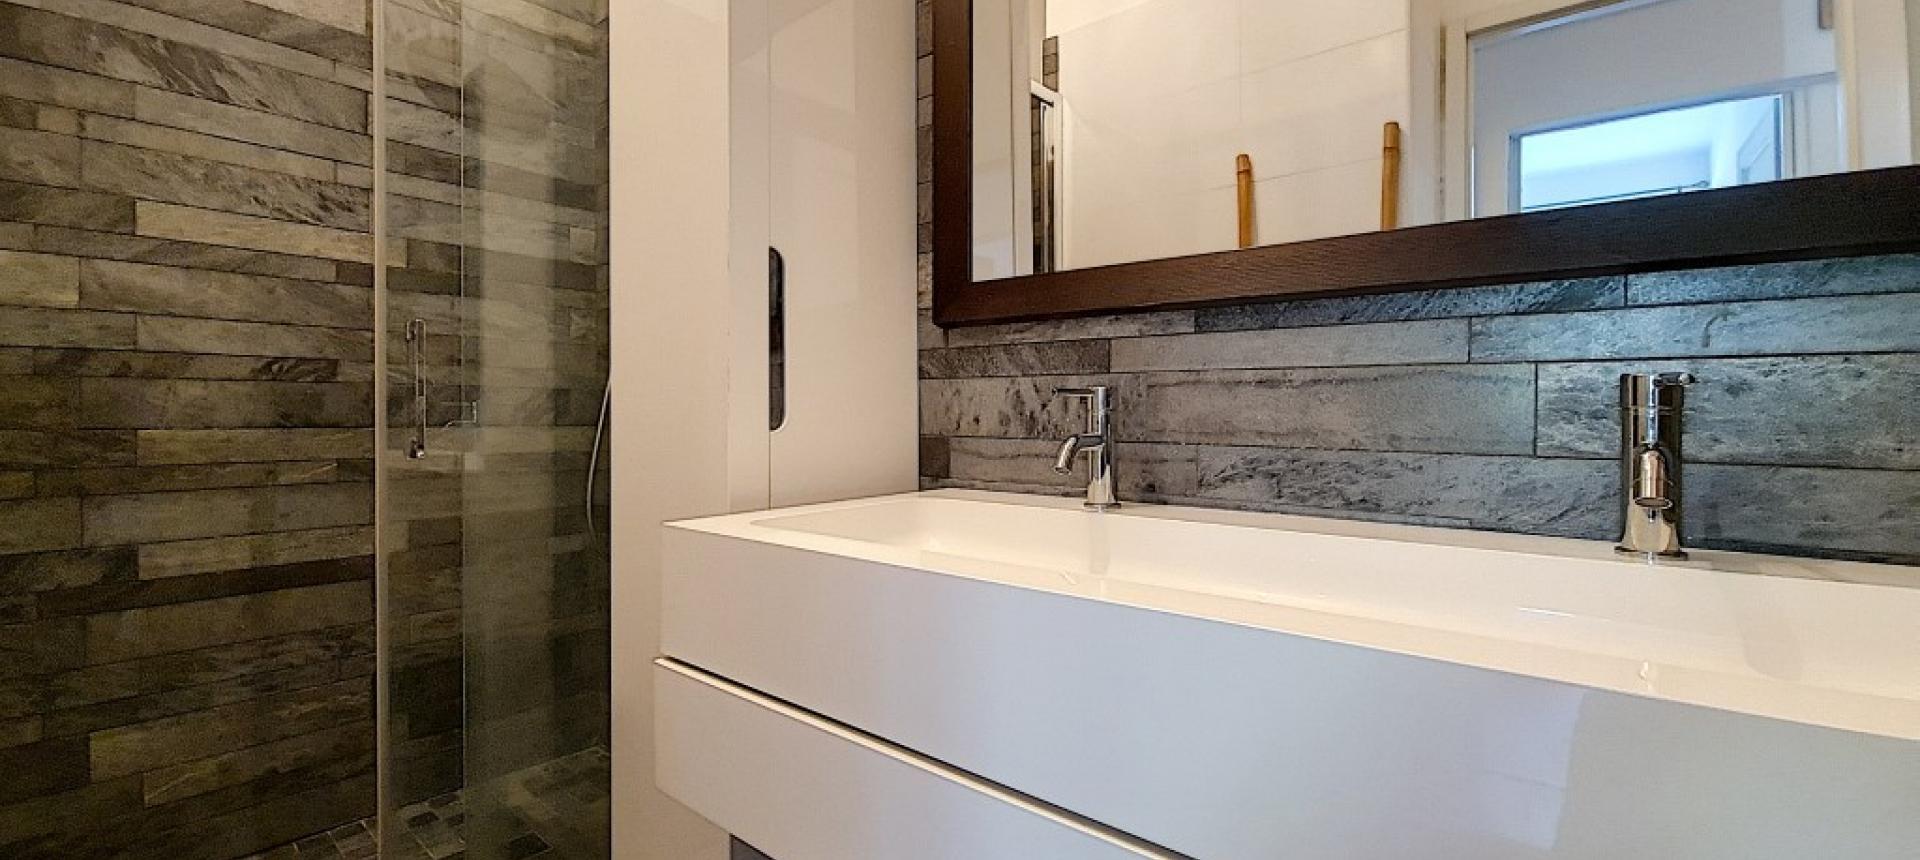 F3 meublé  à louer Rue Waleska salle de douche